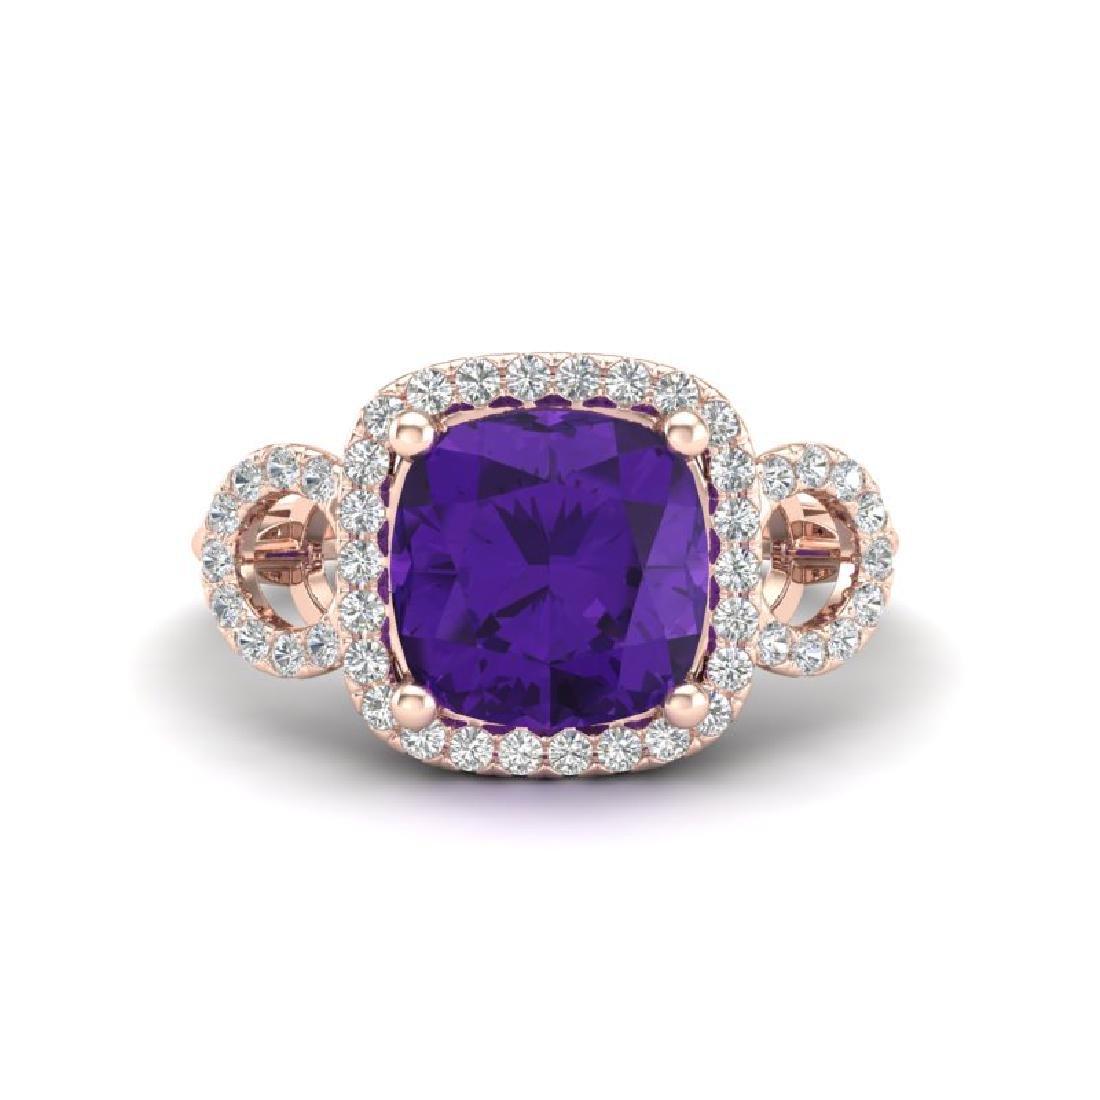 3.75 CTW Amethyst & Micro VS/SI Diamond Ring 14K Rose